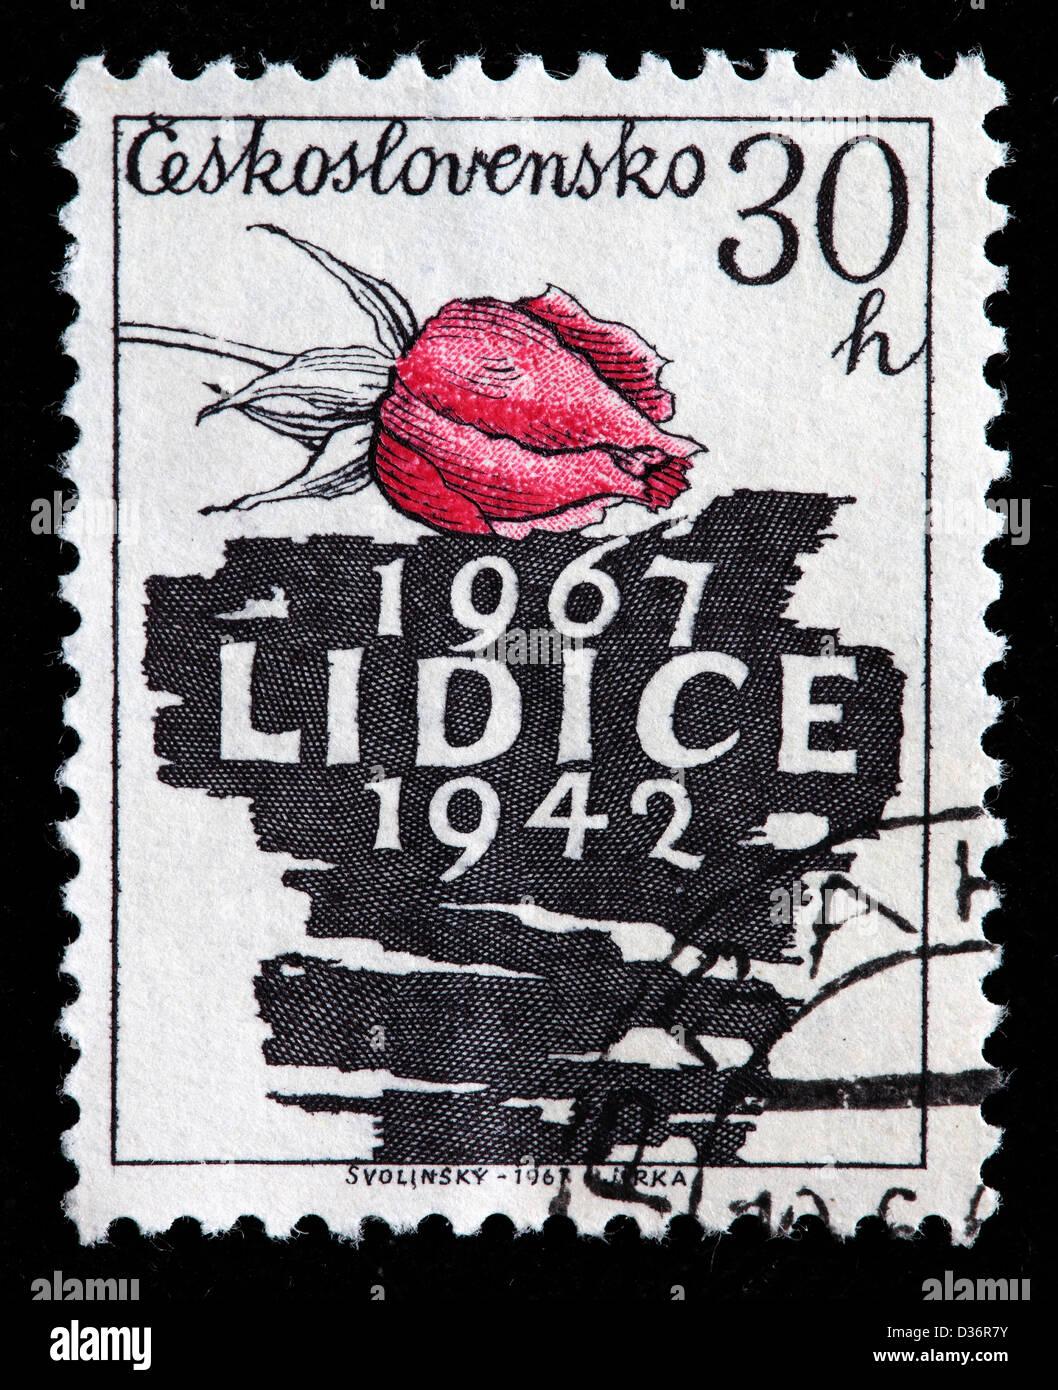 Lidice, postage stamp, Czechoslovakia, 1967 Stock Photo